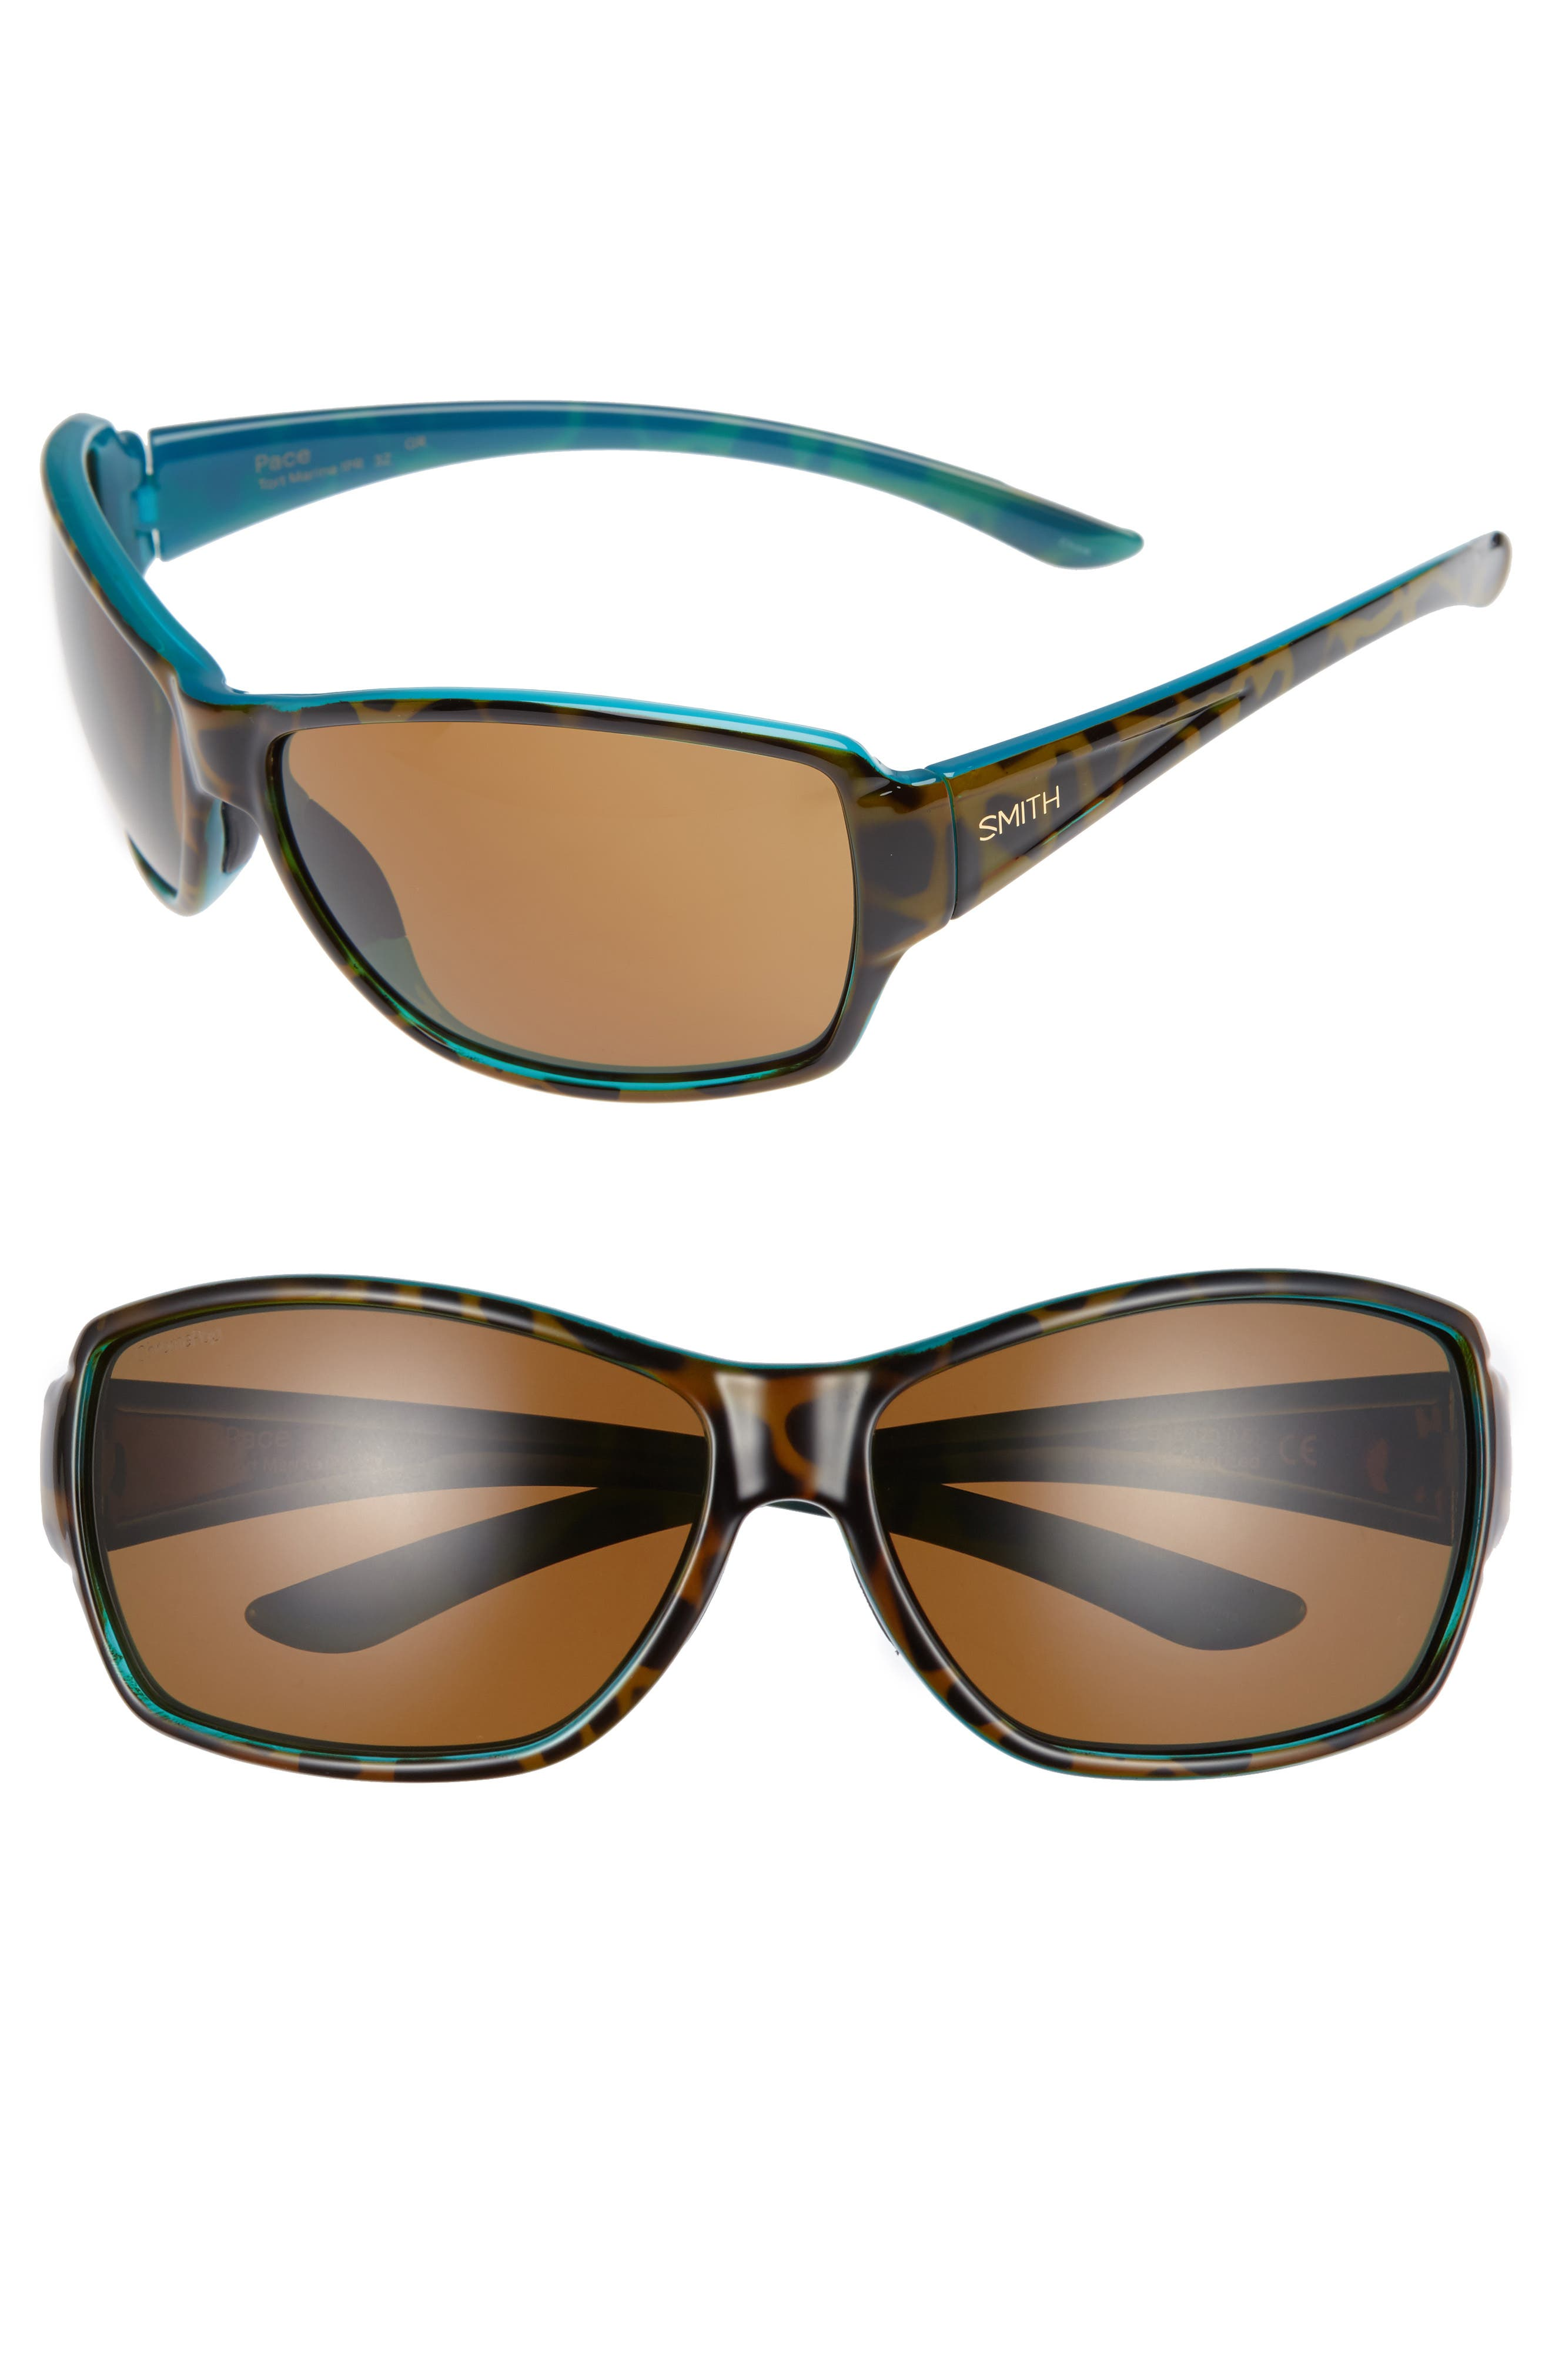 Main Image - Smith 'Pace' 65mm ChromaPop™ Polarized Sunglasses